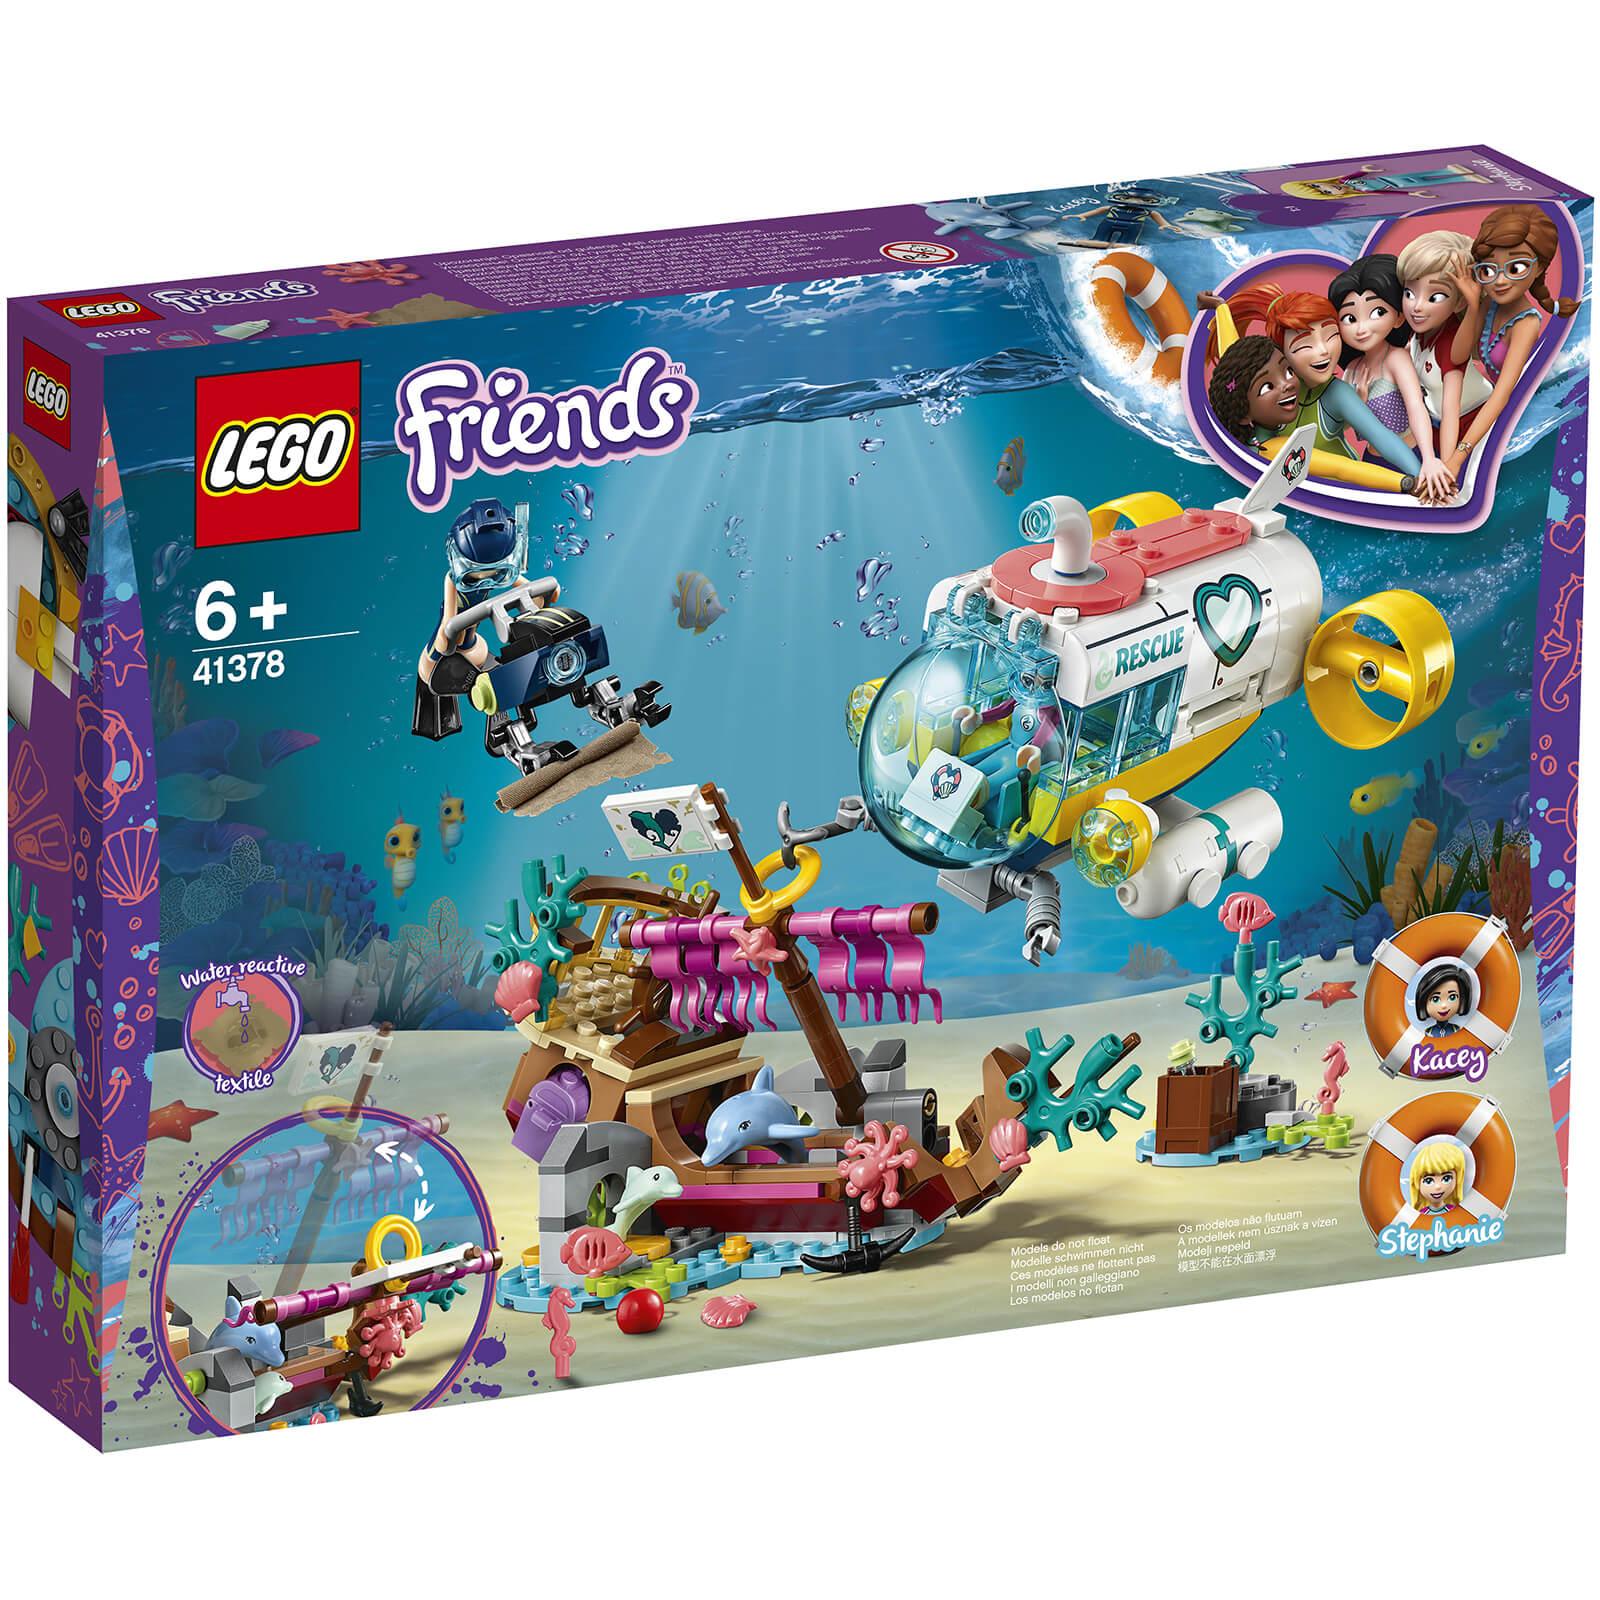 Ultramoderne LEGO Friends: Dolphins Rescue Mission (41378) Toys   Zavvi CX-61